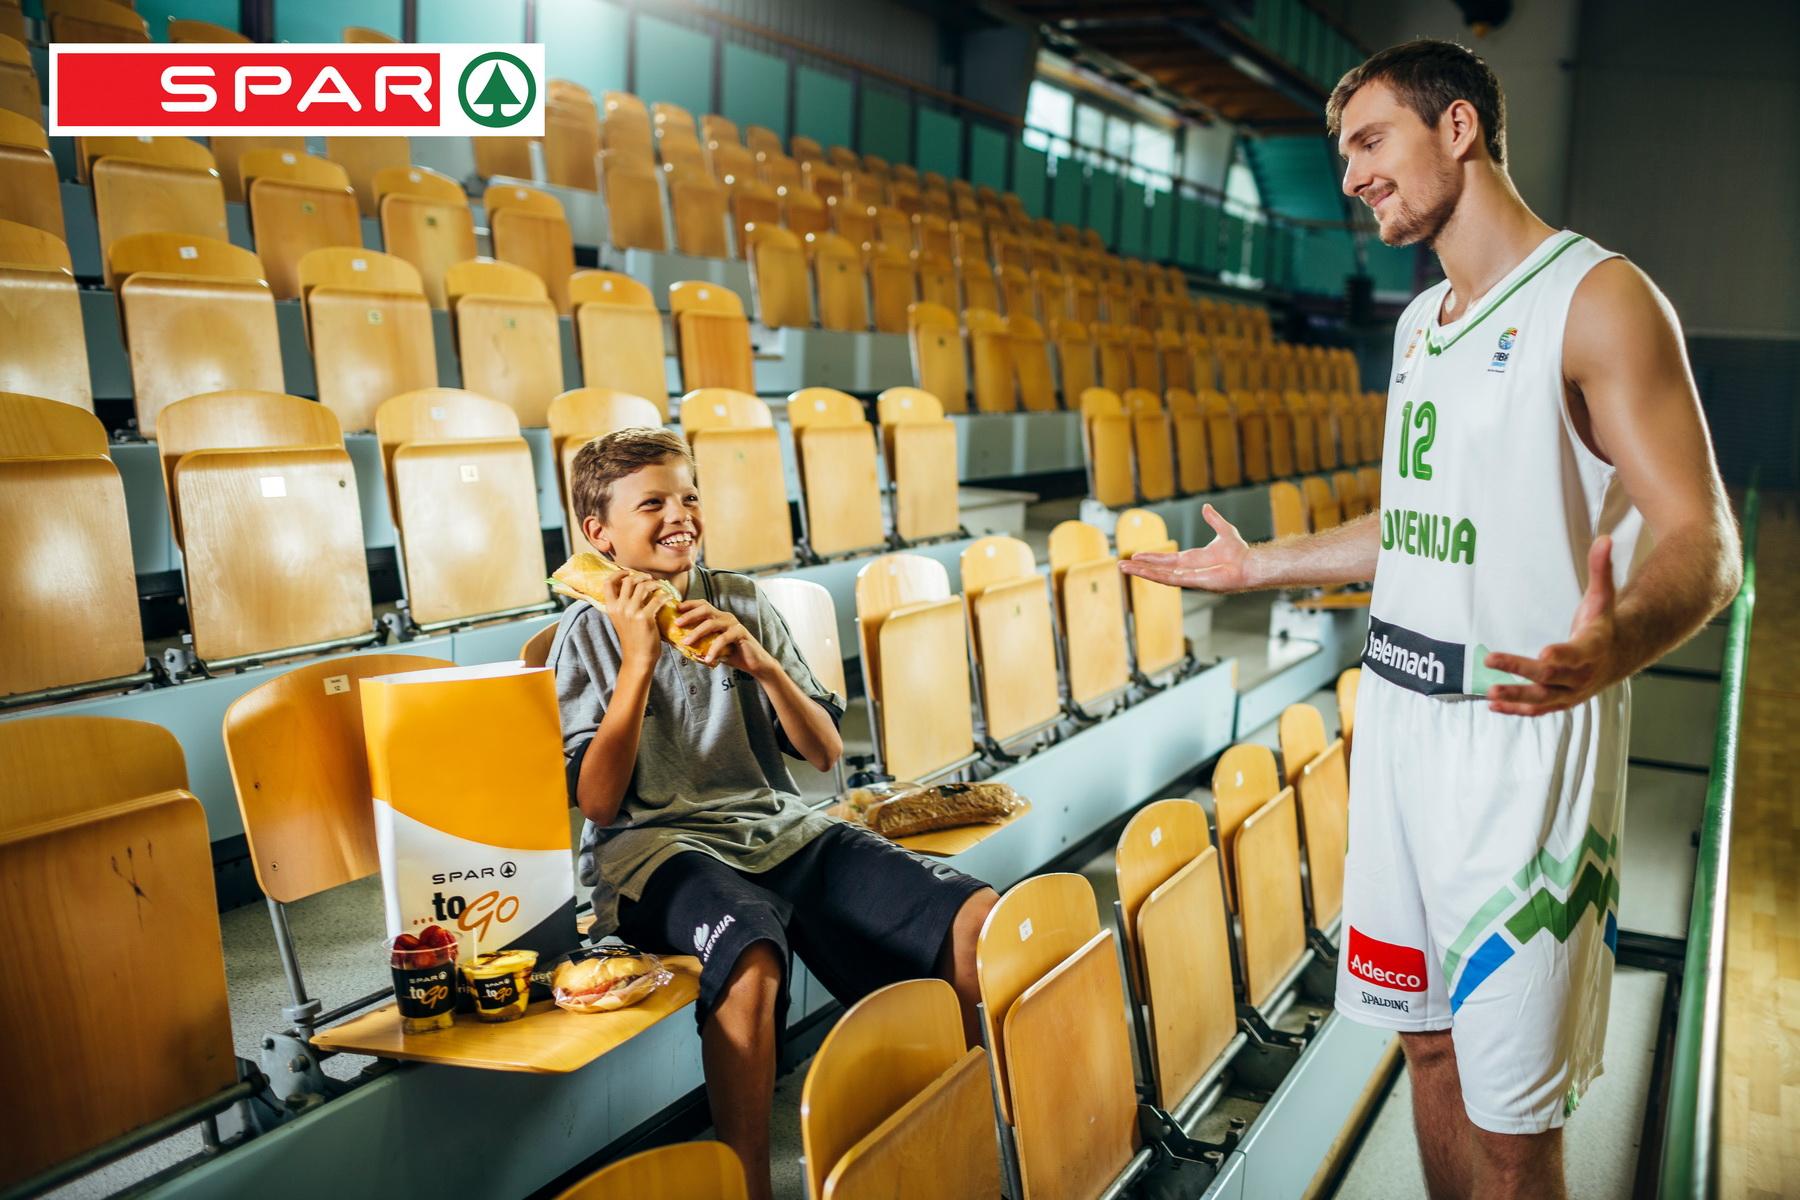 andraz_blaznik-advertising-25.jpg